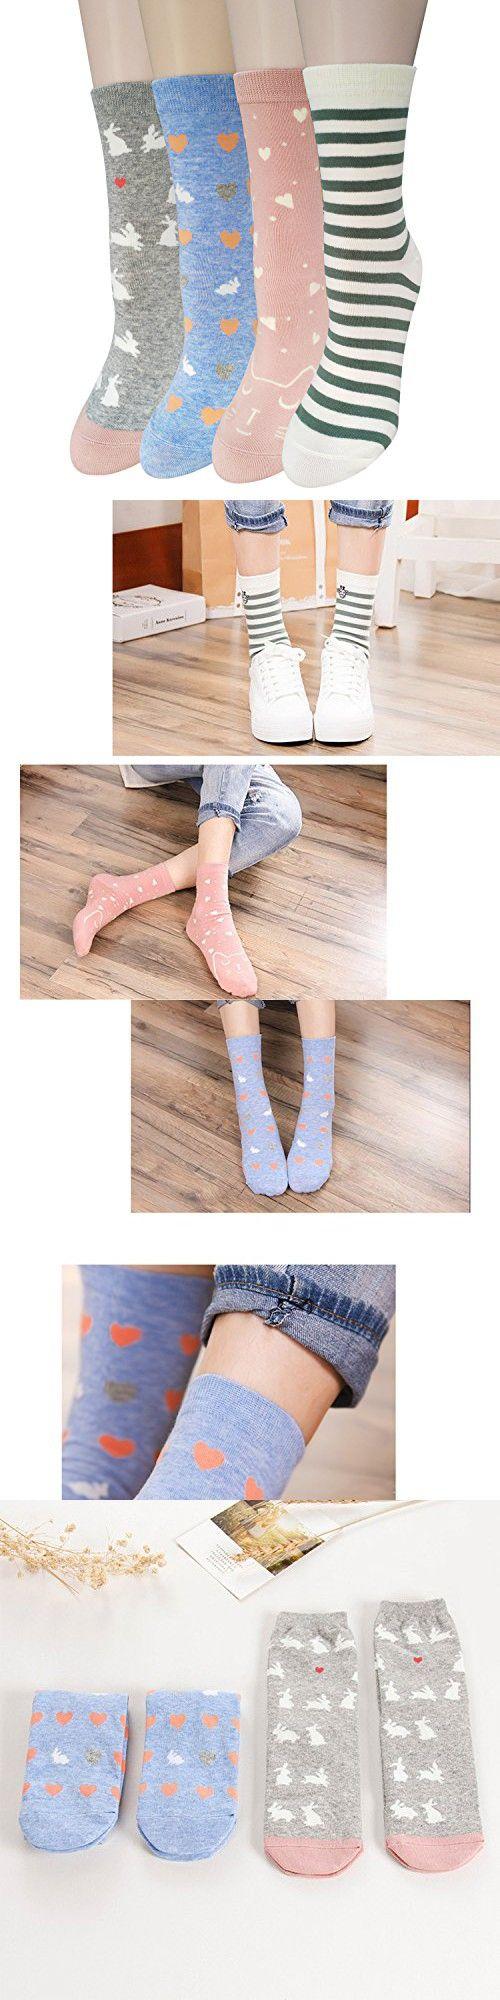 4 Pairs Womens Cute Animal Socks, Fun and Cool 100% Cotton Art Socks